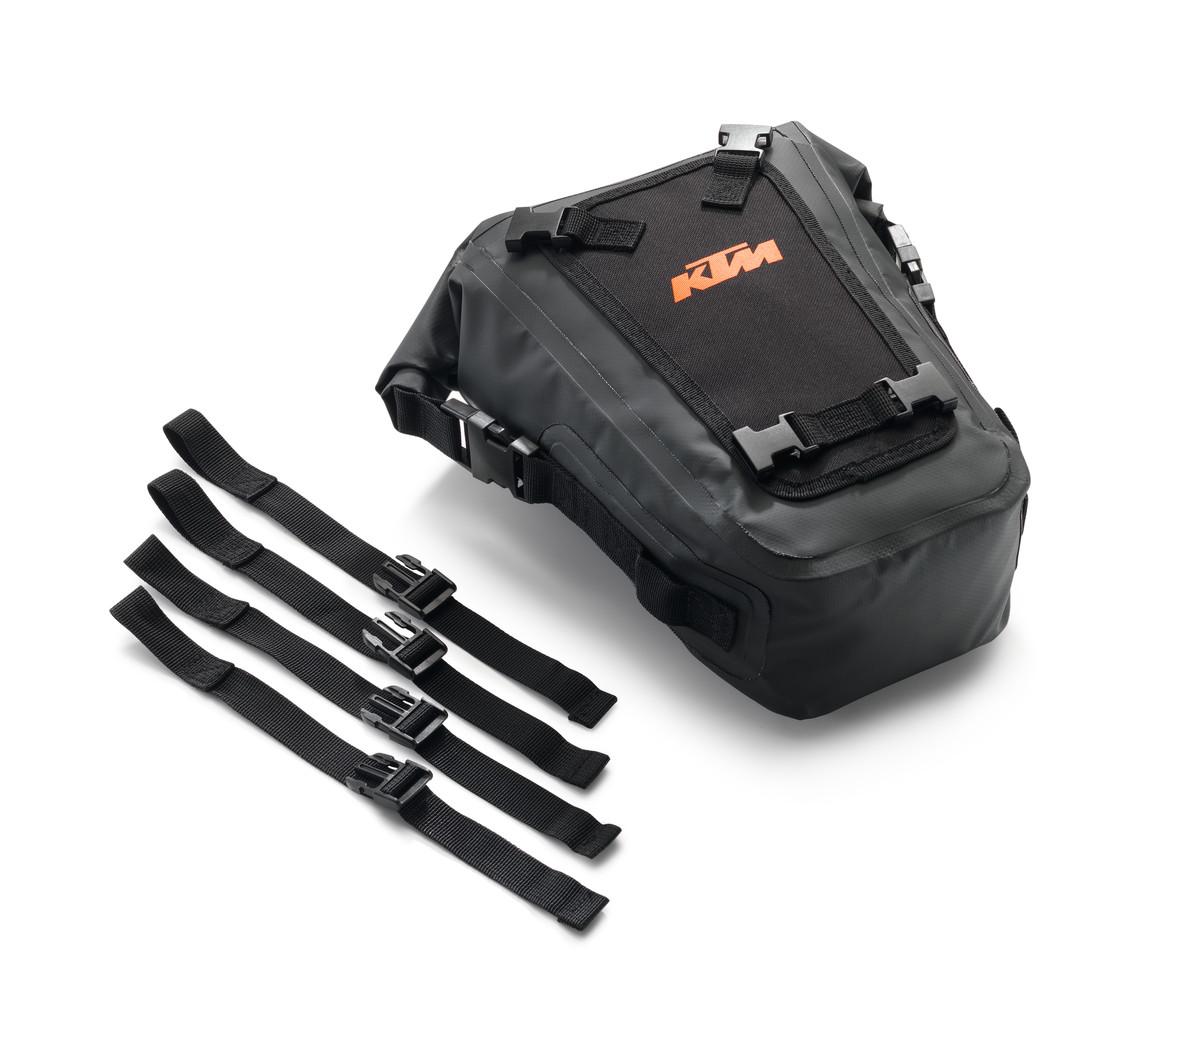 1190 1290 Adventure Aomcmx Ktm 640 Lc4 Wiring Diagram 2003 Universal Offroad Rear Fender Bag